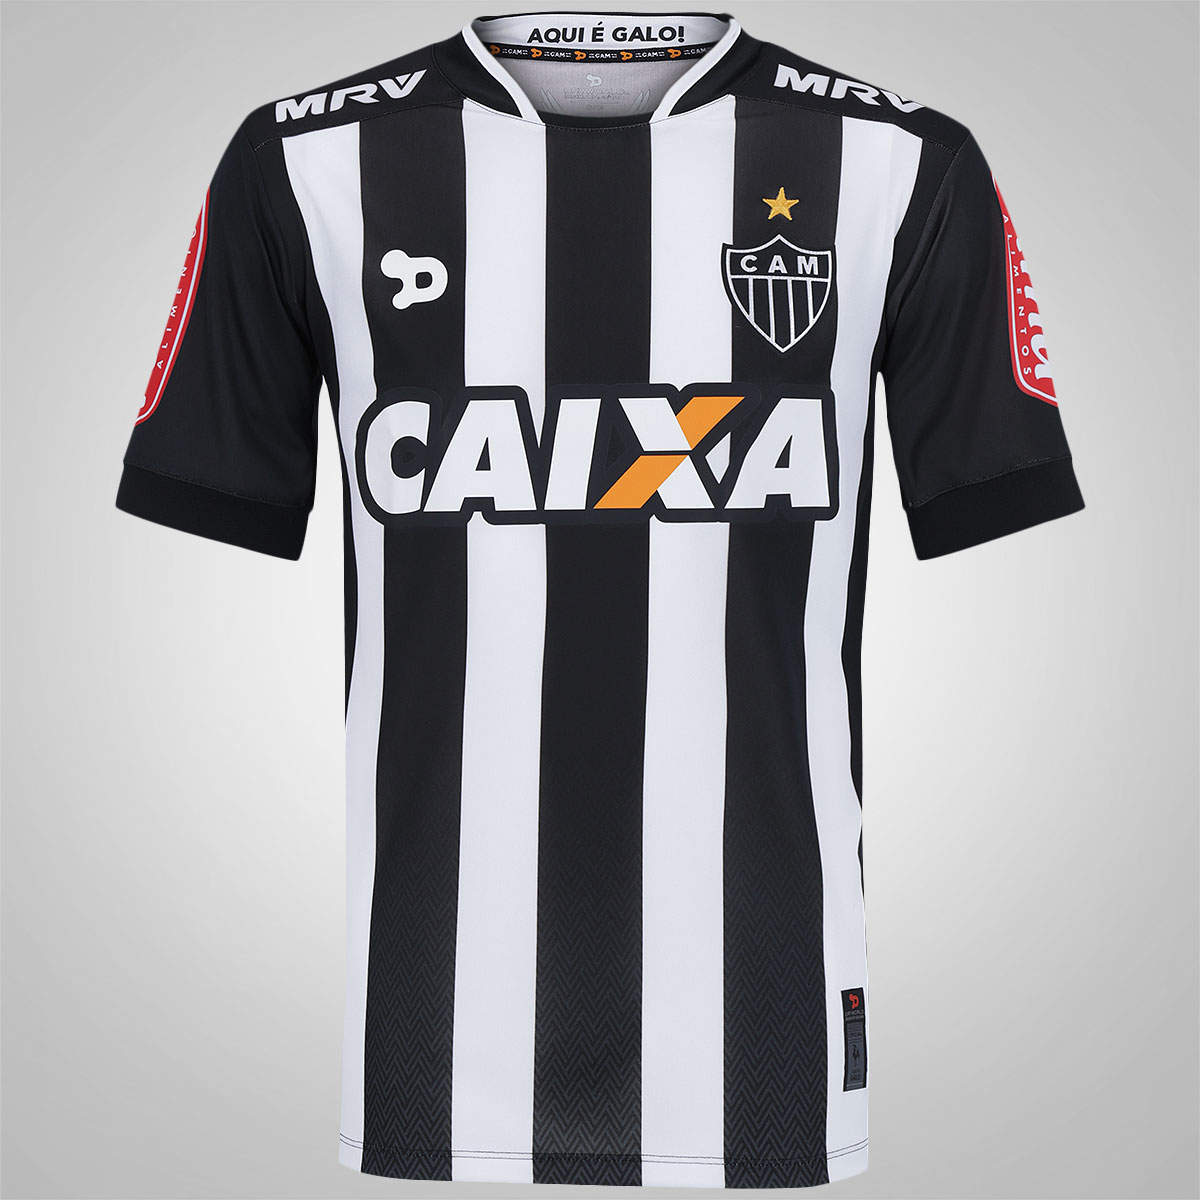 Camisa Atlético Mineiro Dryworld 2016 Nº9